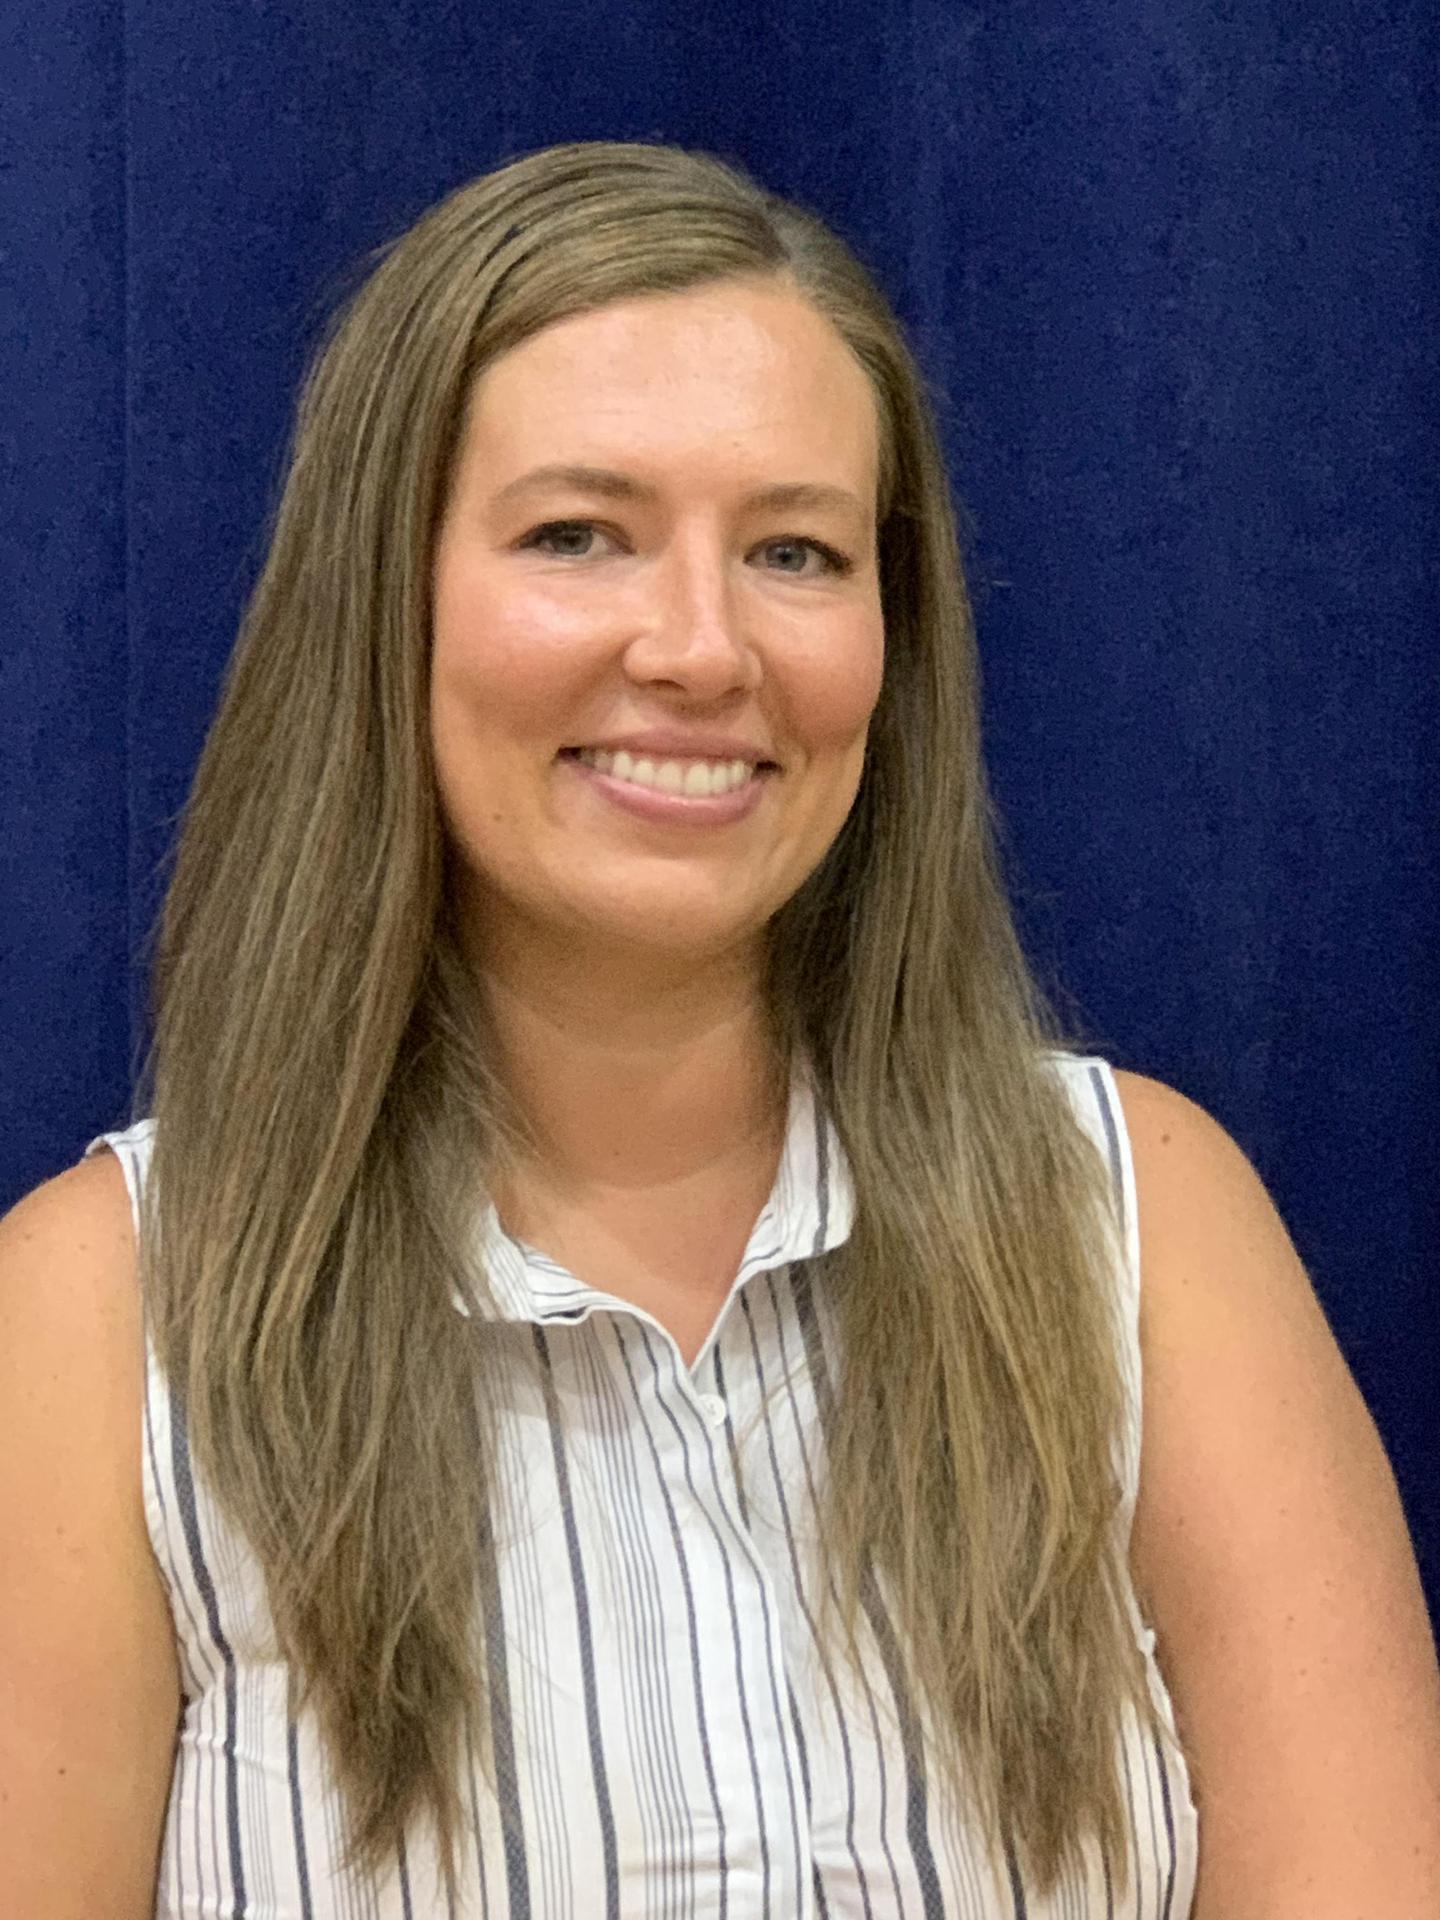 Principal Melissa Bru